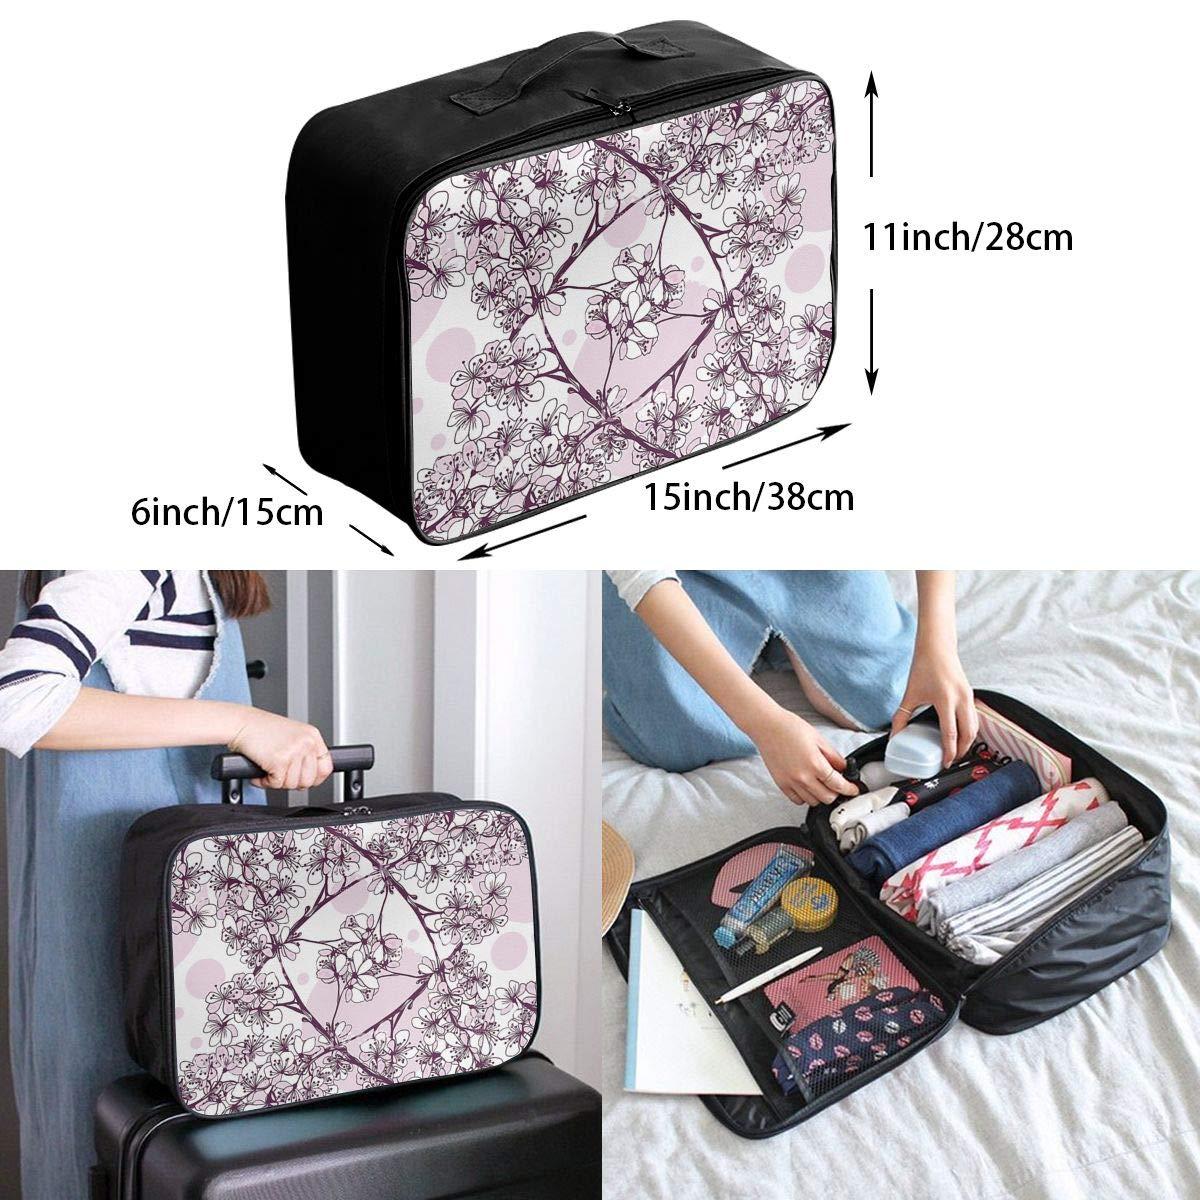 Travel Luggage Duffle Bag Lightweight Portable Handbag Flowers Pattern Large Capacity Waterproof Foldable Storage Tote